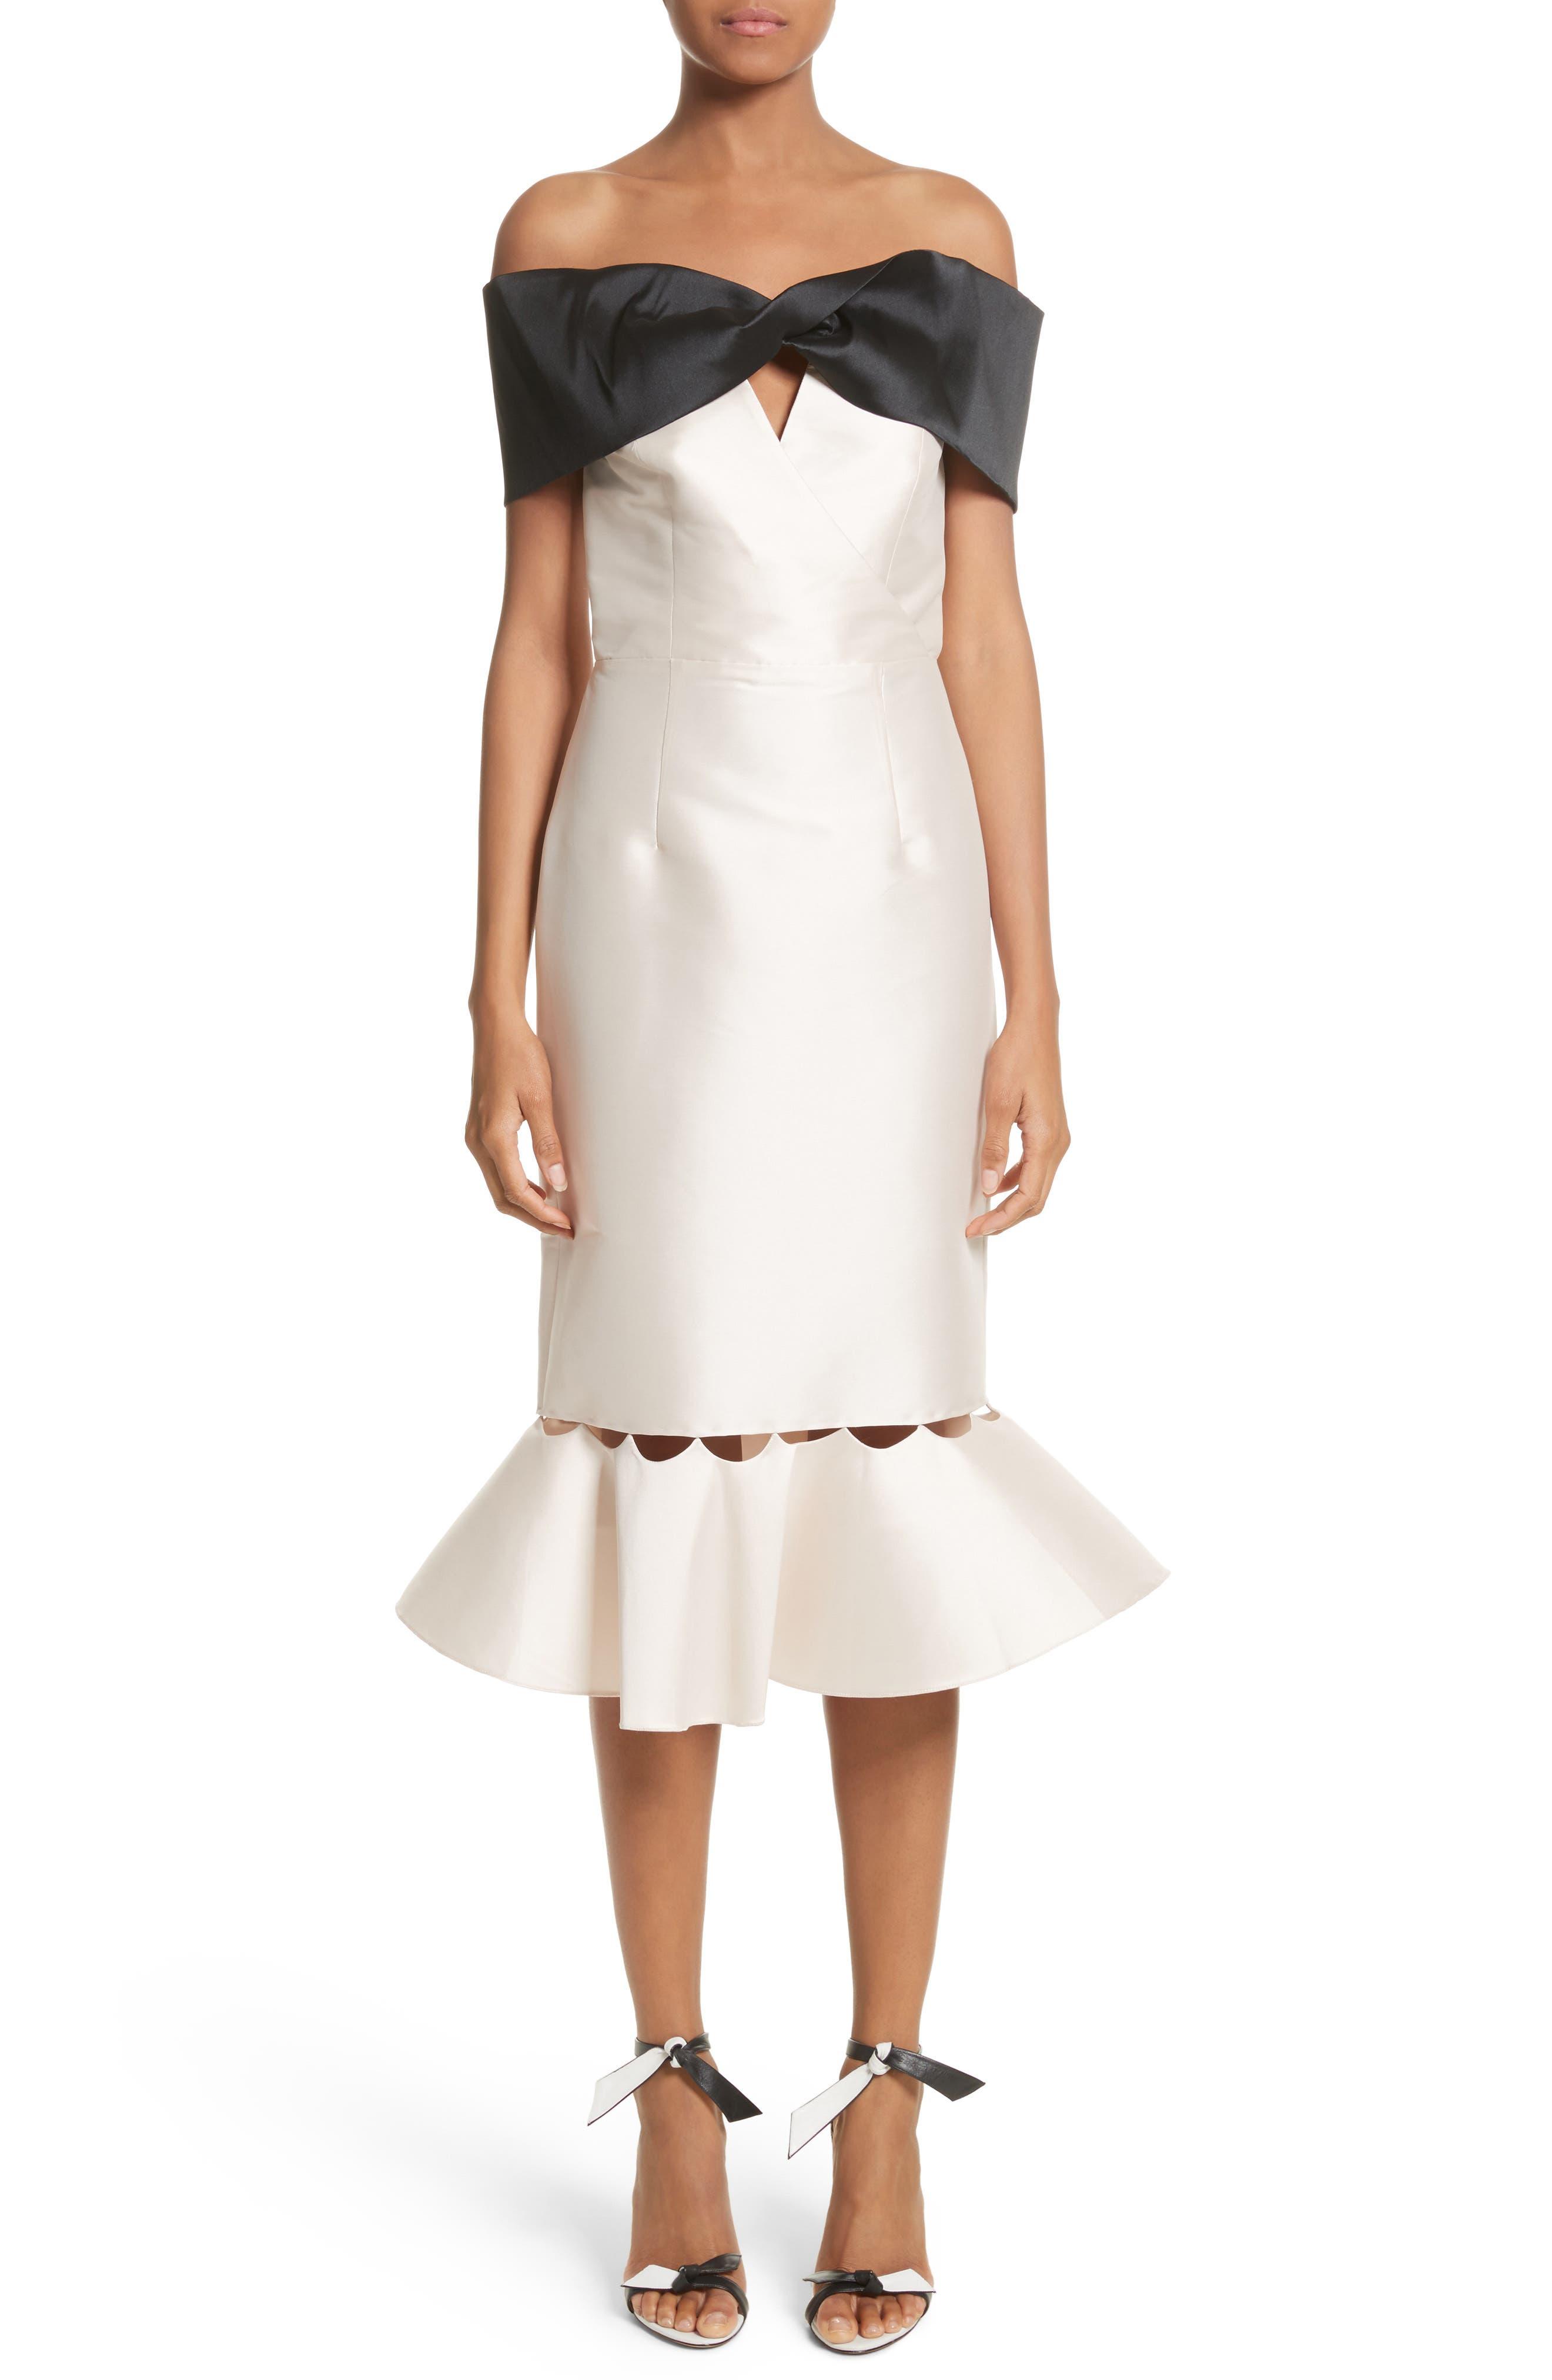 Alternate Image 1 Selected - Sachin & Babi Noir Asli Colorblock Off the Shoulder Sheath Dress